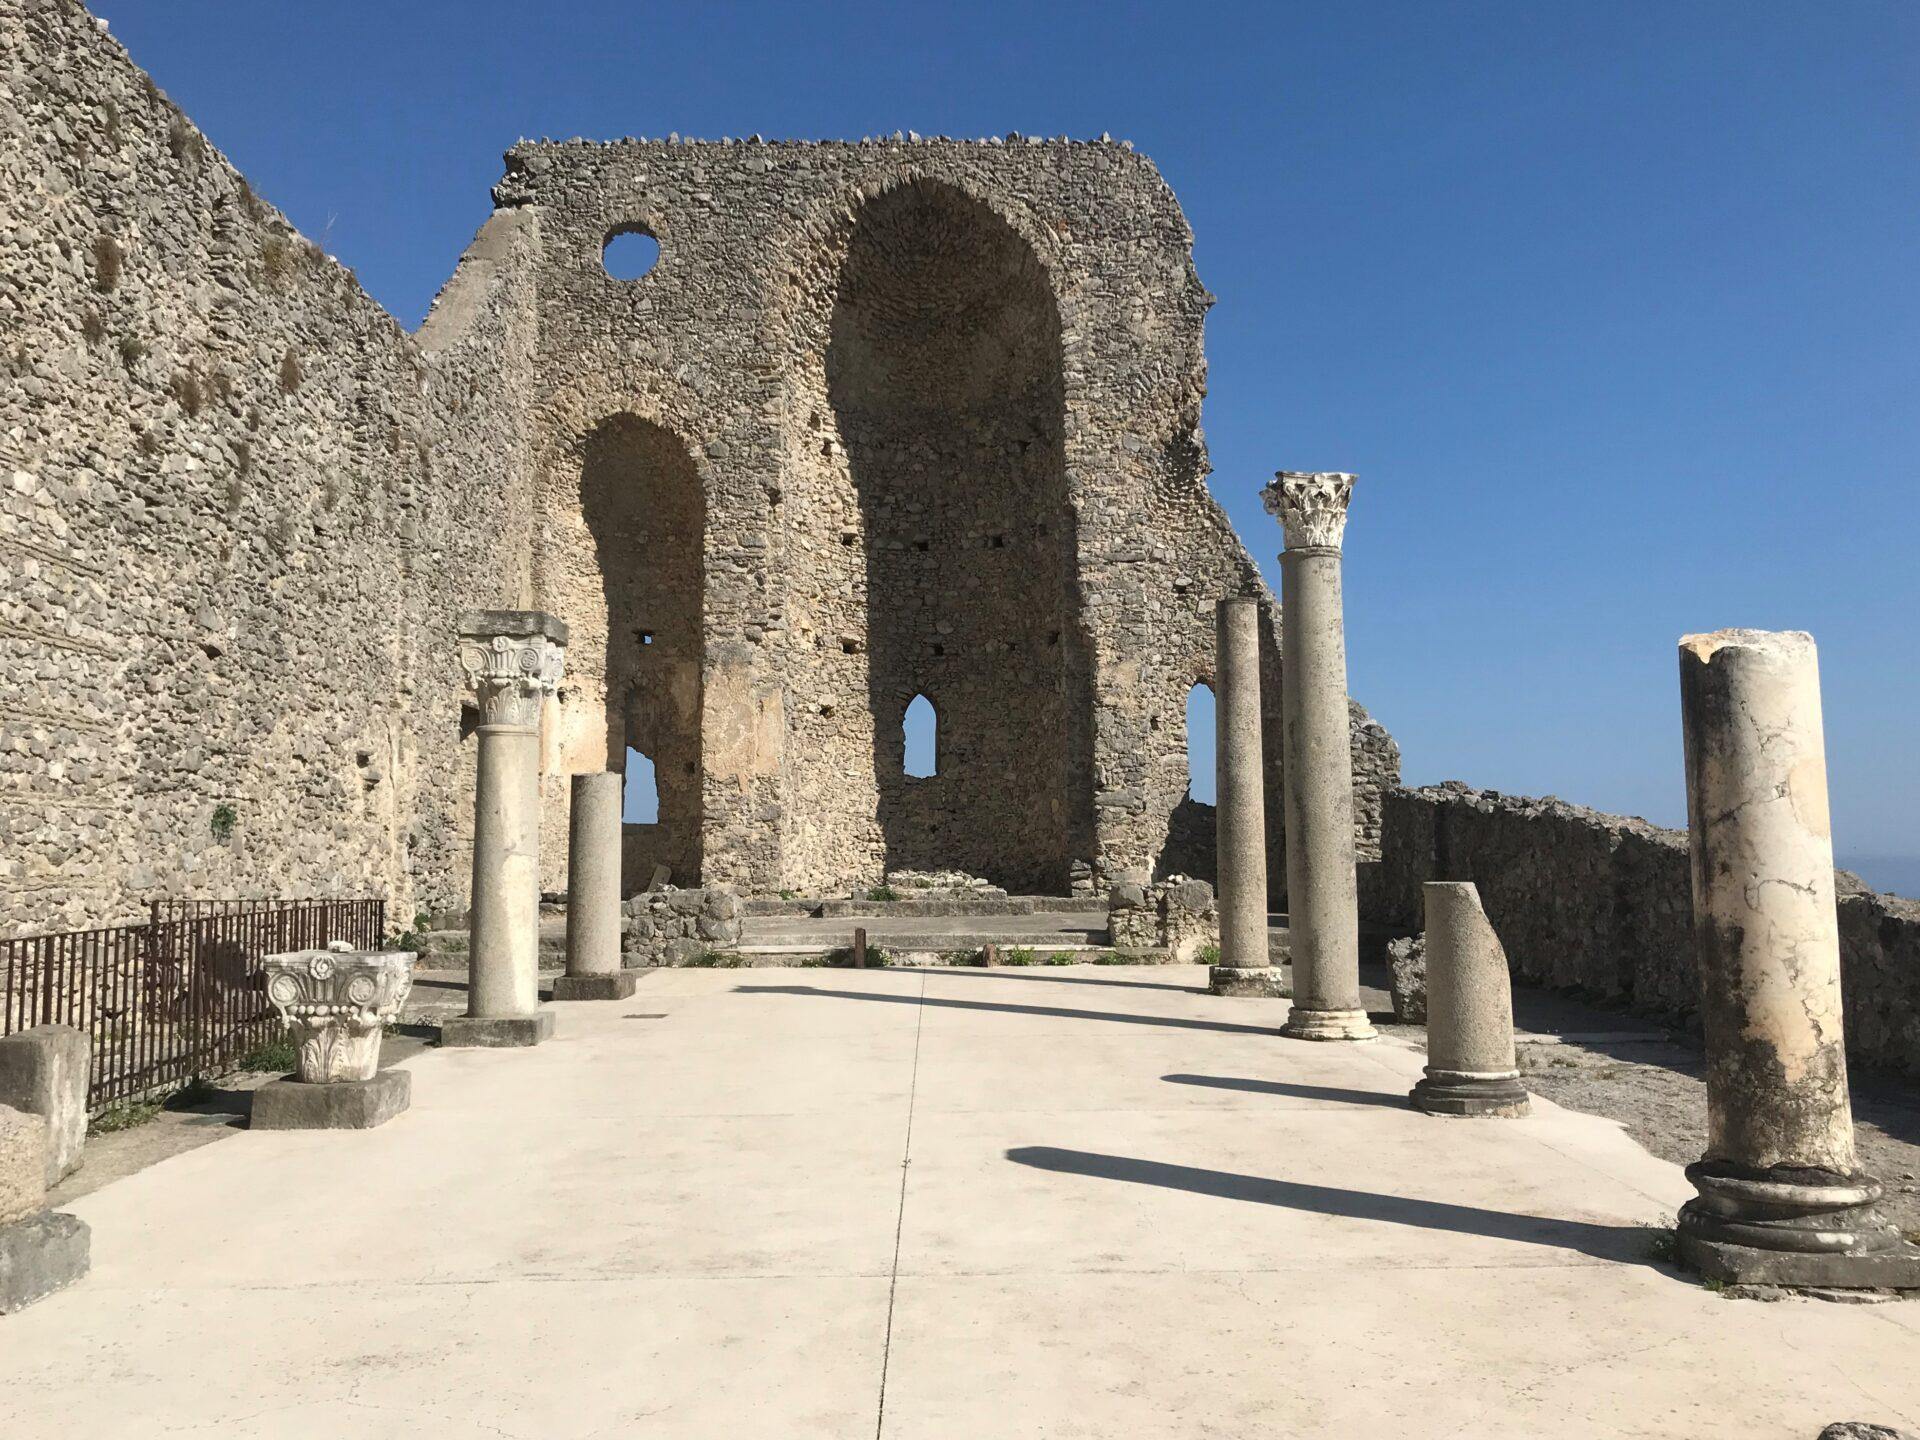 Die Ruine von Sant'Eustachio, Scala